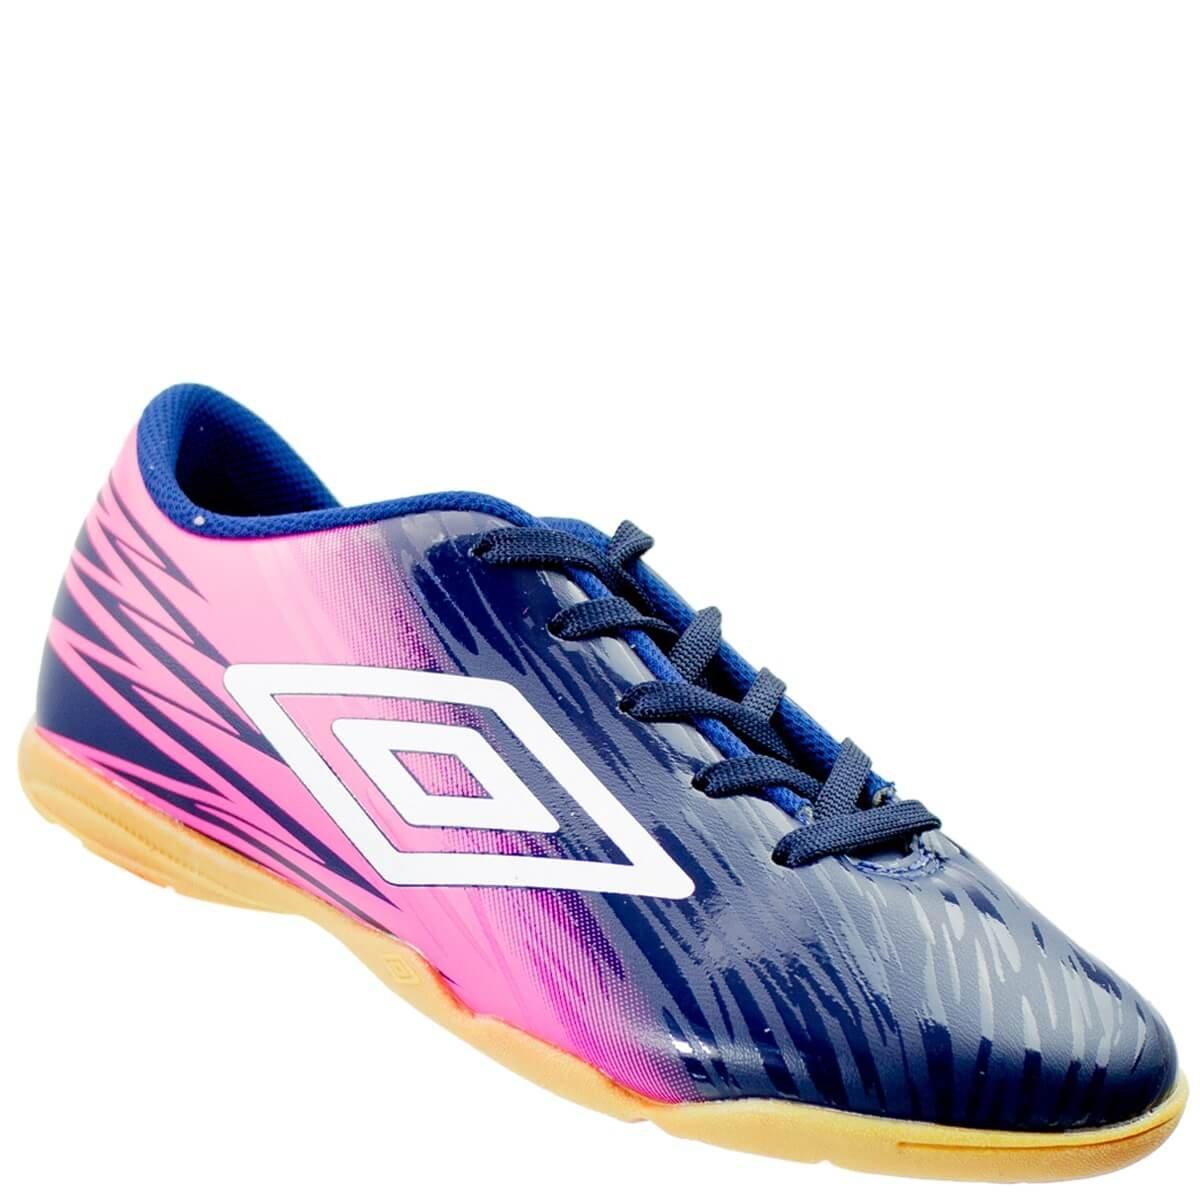 Bizz Store Agasalho Feminino Nike Suit Esportivo Rosa 7796e3b4deb9c